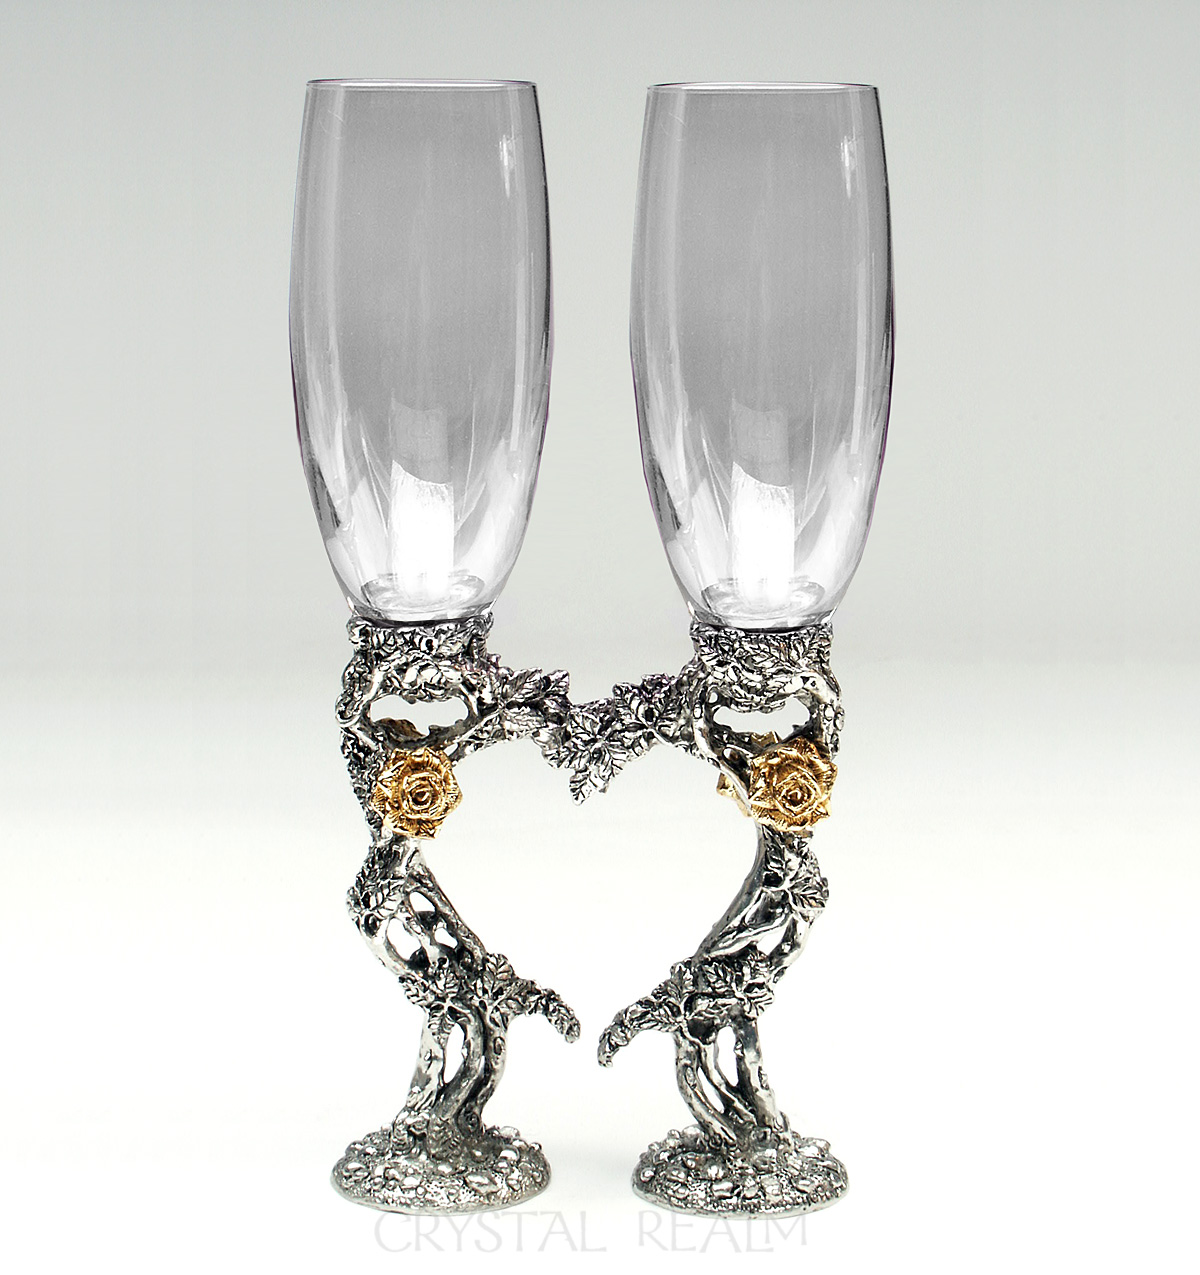 Vintage pewter champagne toasting glasses